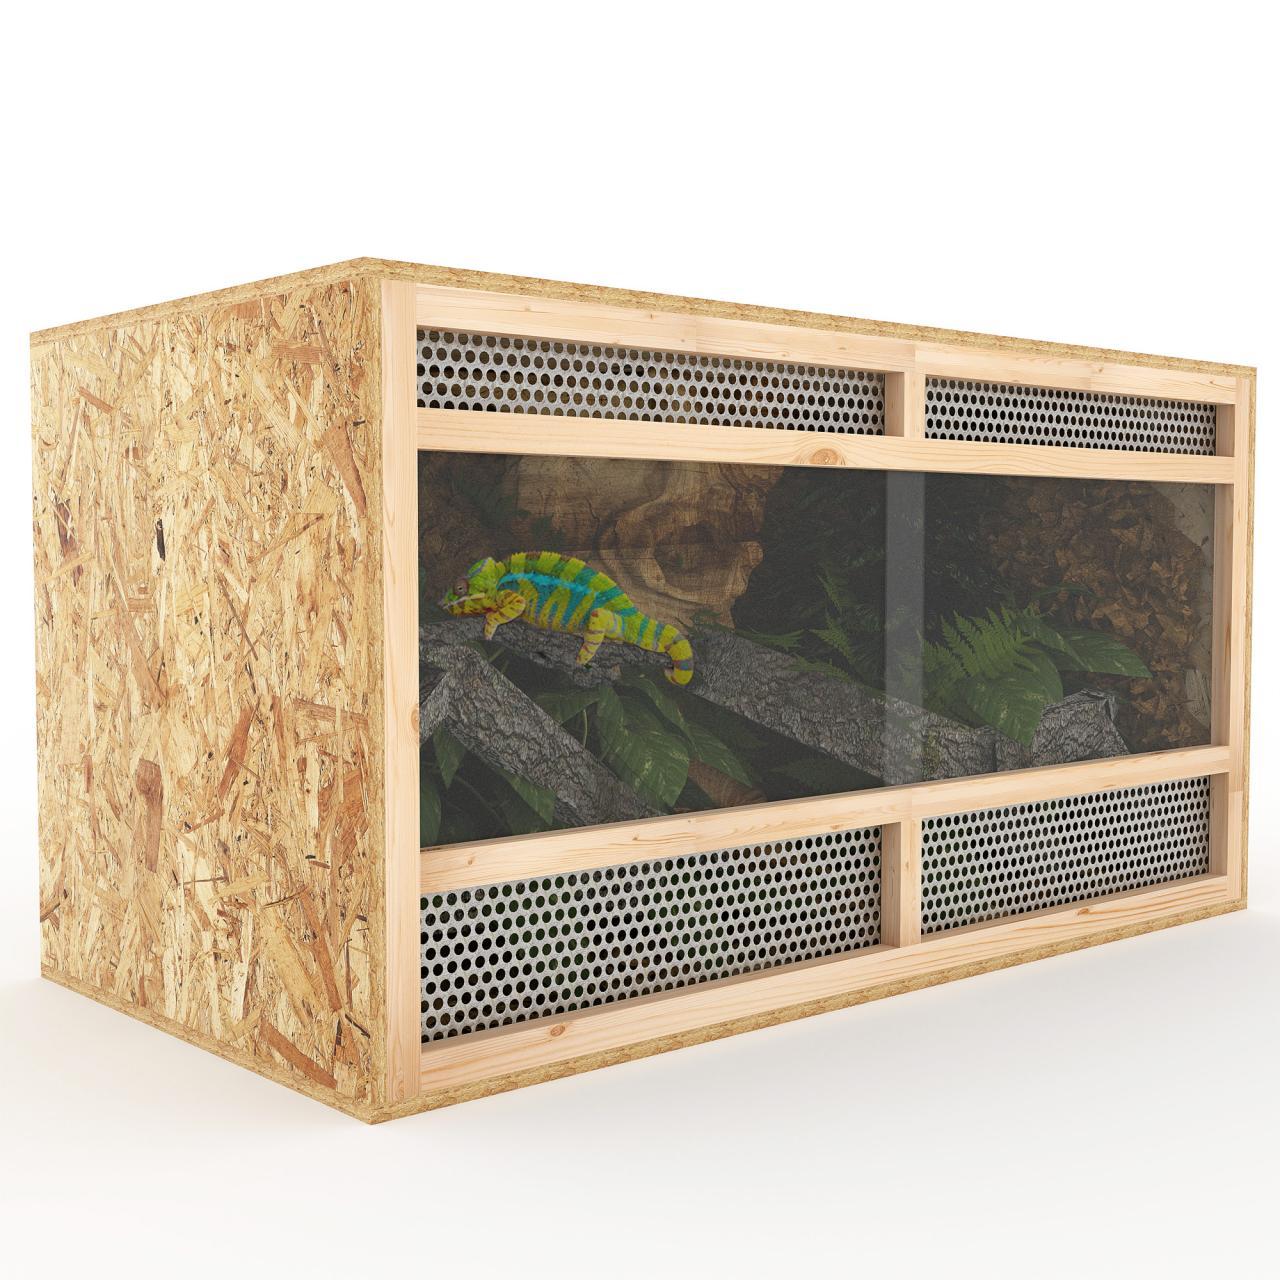 Terrarium-Holz-Holzkaefig-OSB-Plexi-Reptilien-Schlangen-Holzterrarium-Groessenwahl